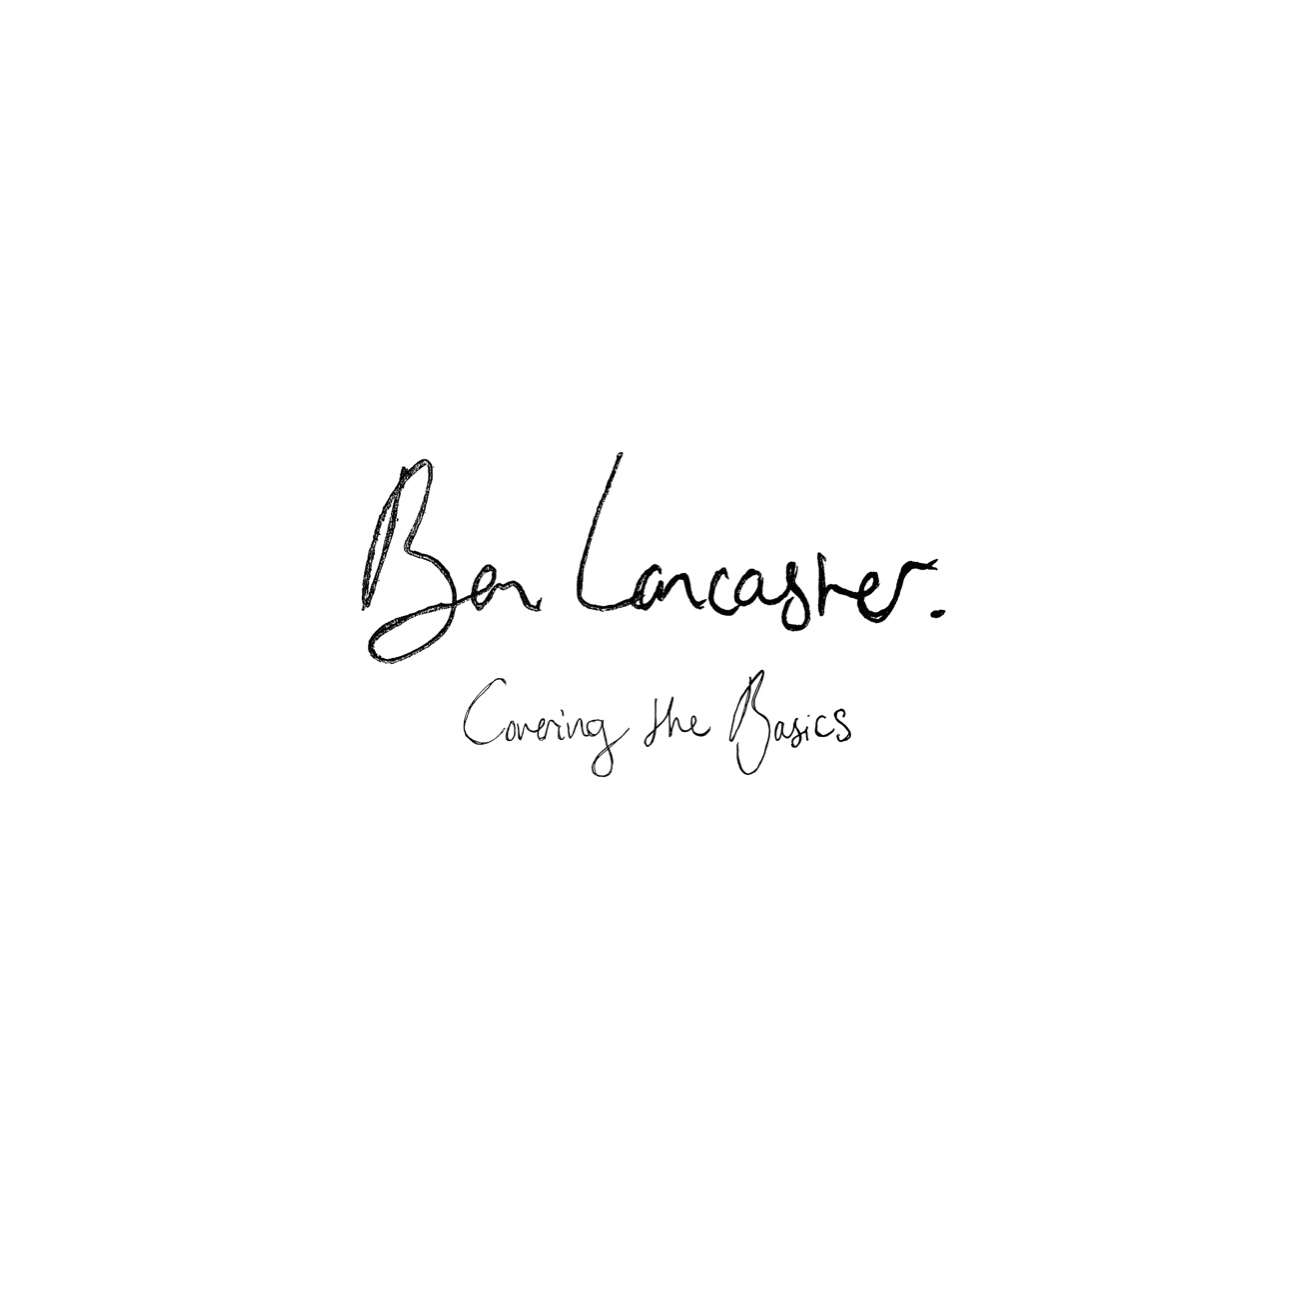 BEN LANCASTER - COVERING THE BASICS